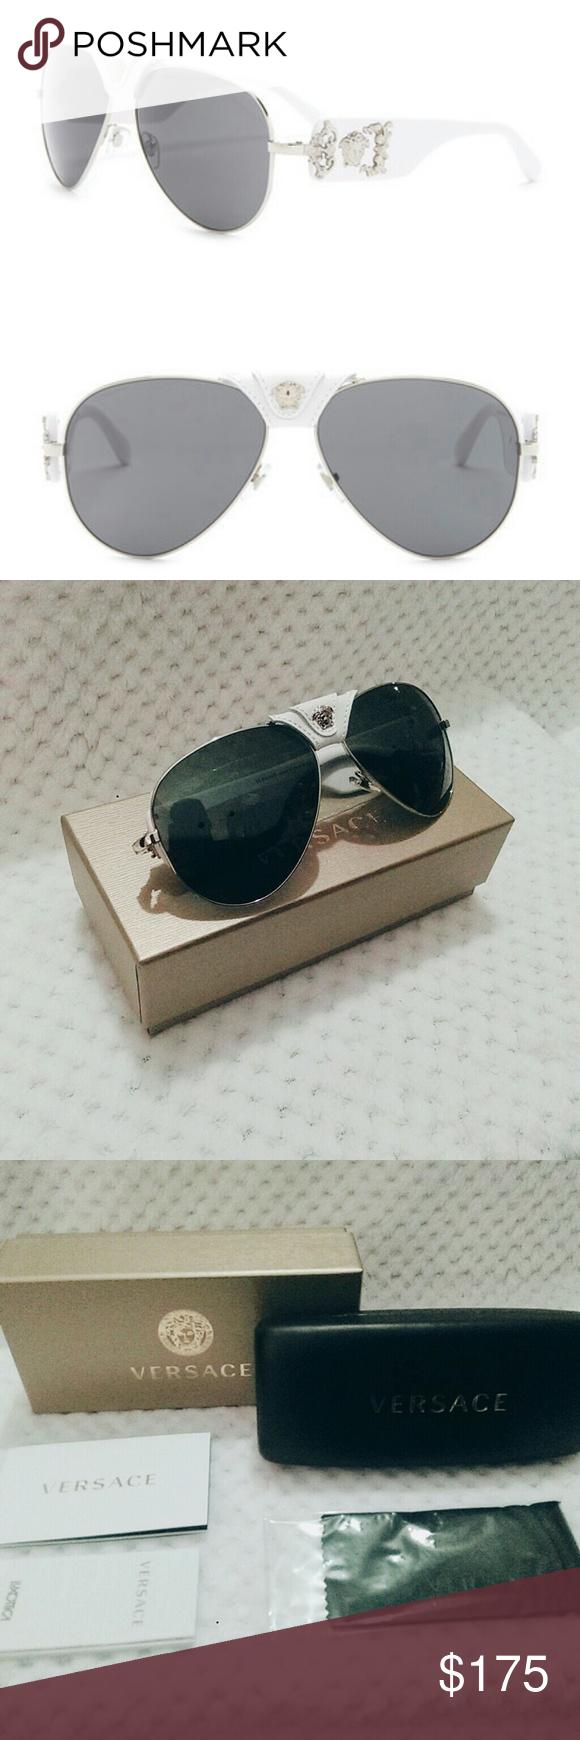 4281b054b7e Versace Rock Icons Medusa Sunglasses Brand new